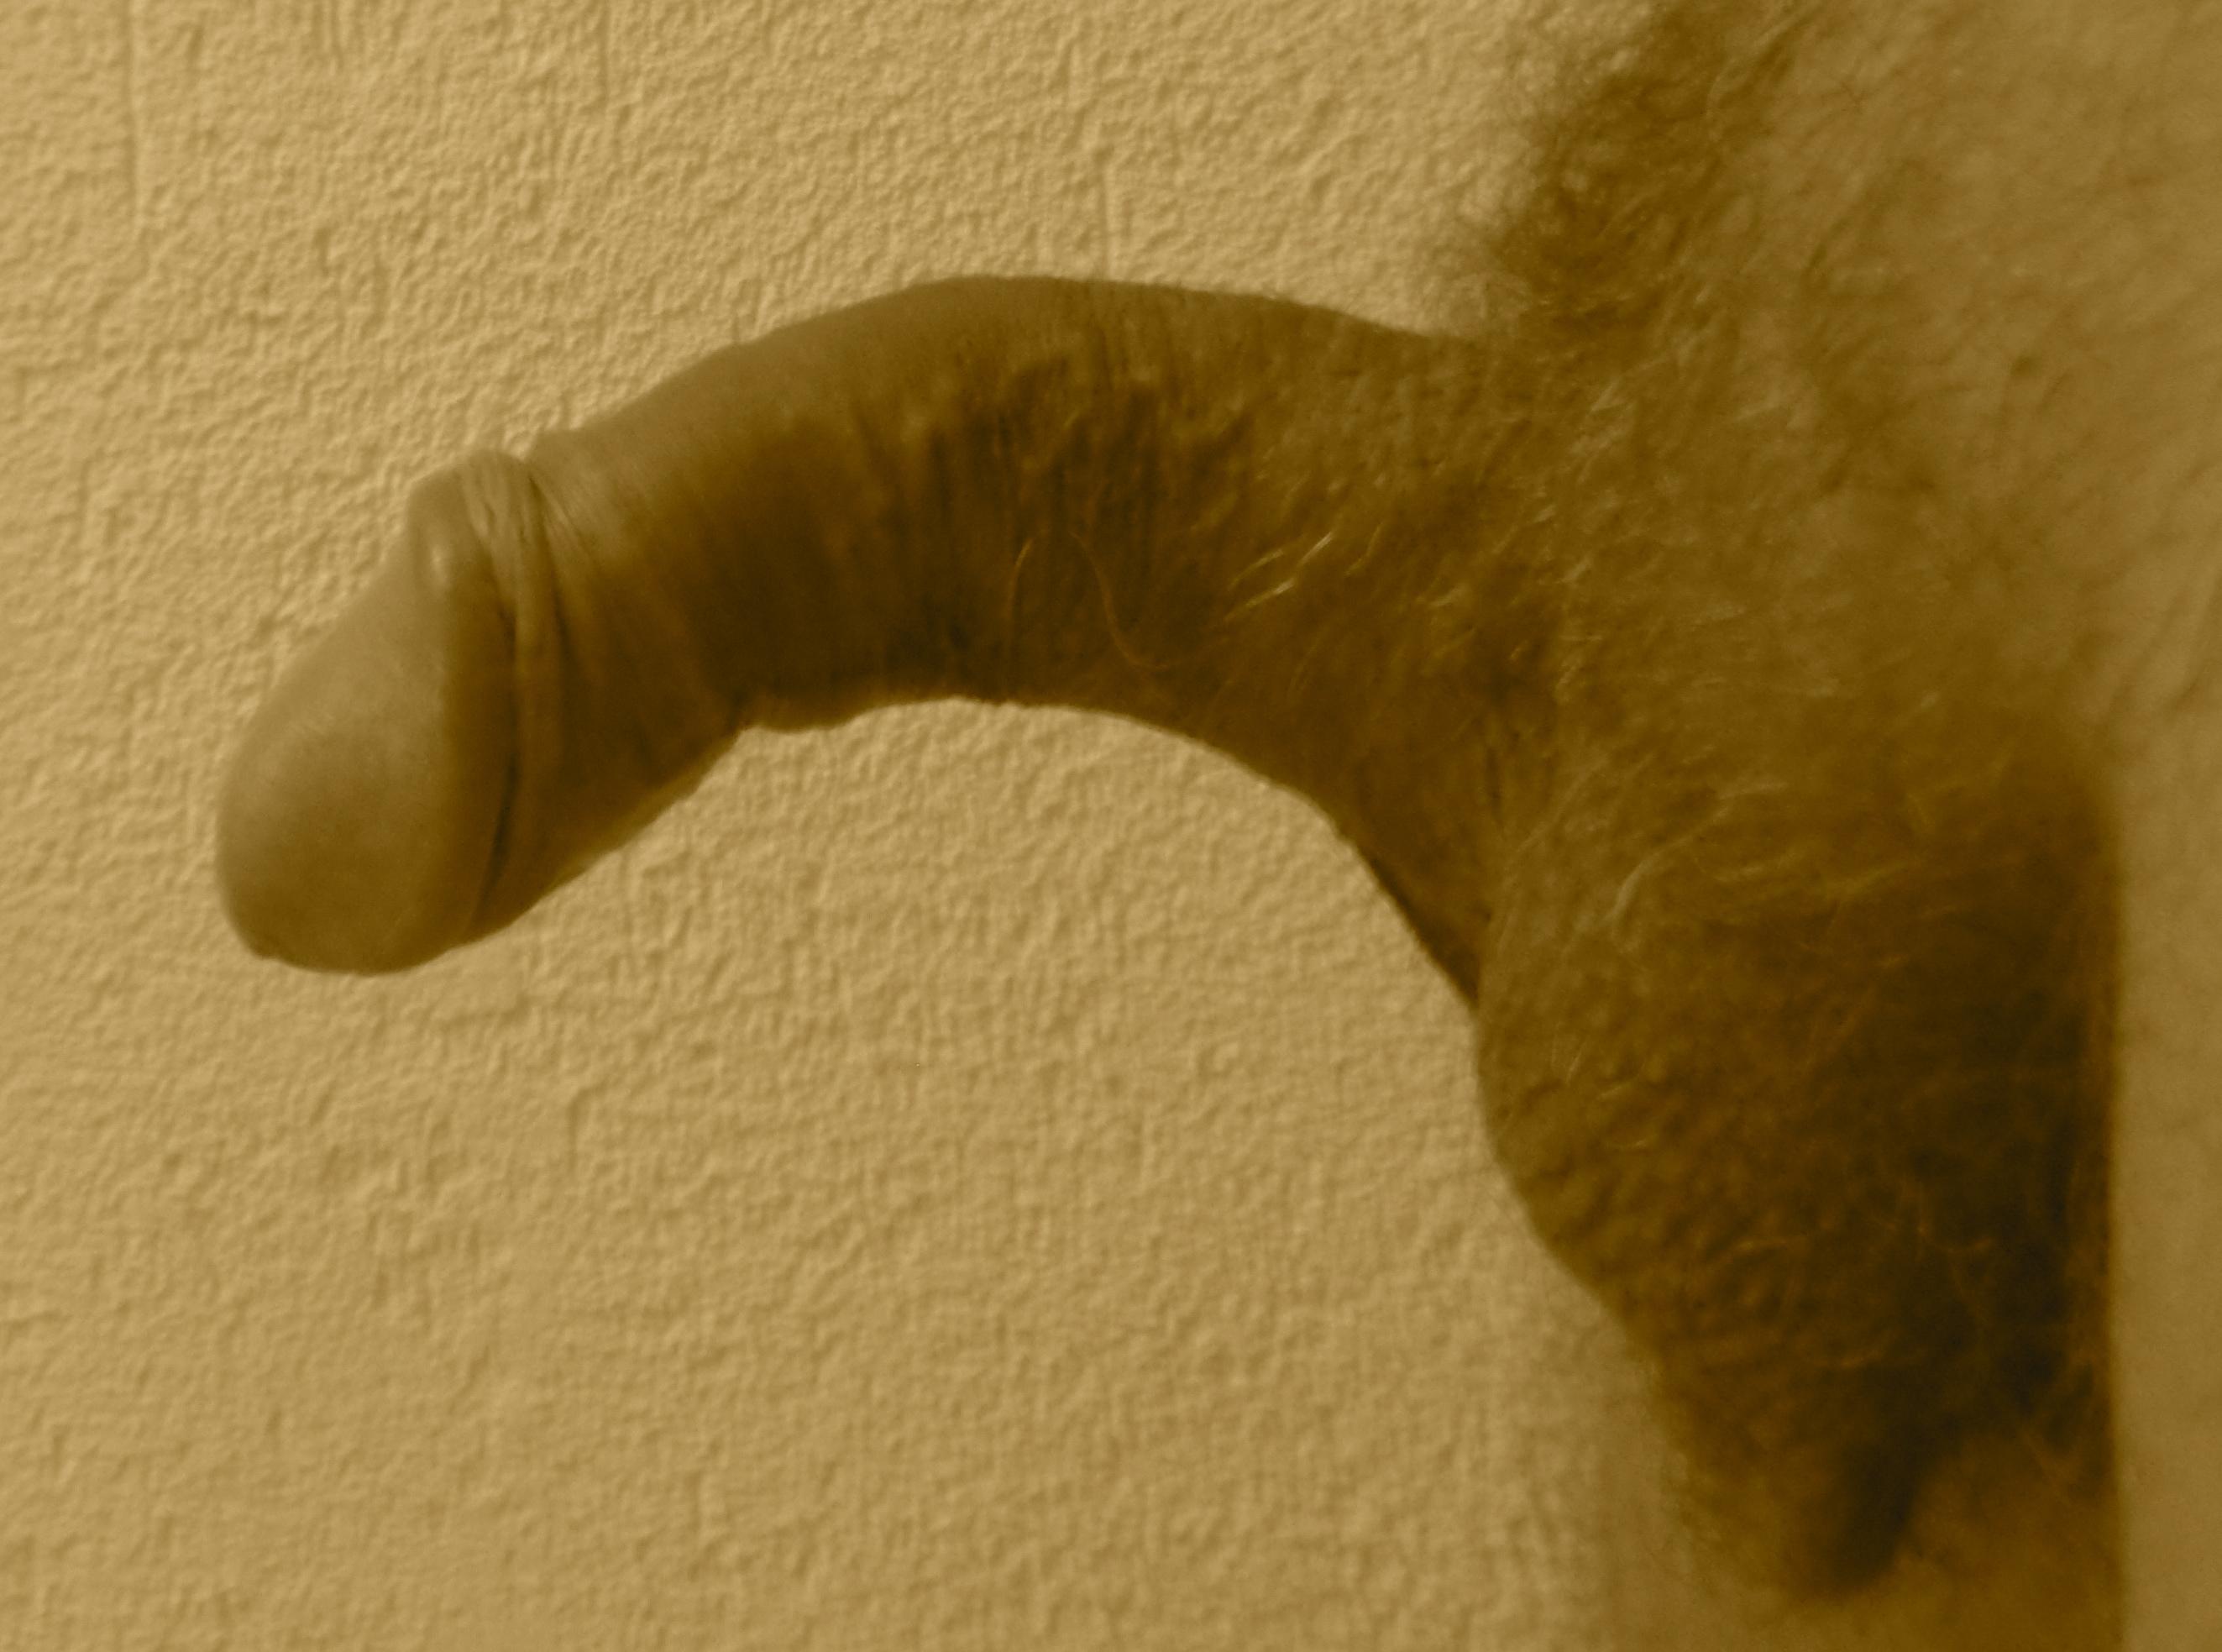 Lapeyronie : pénis courbé vers le bas